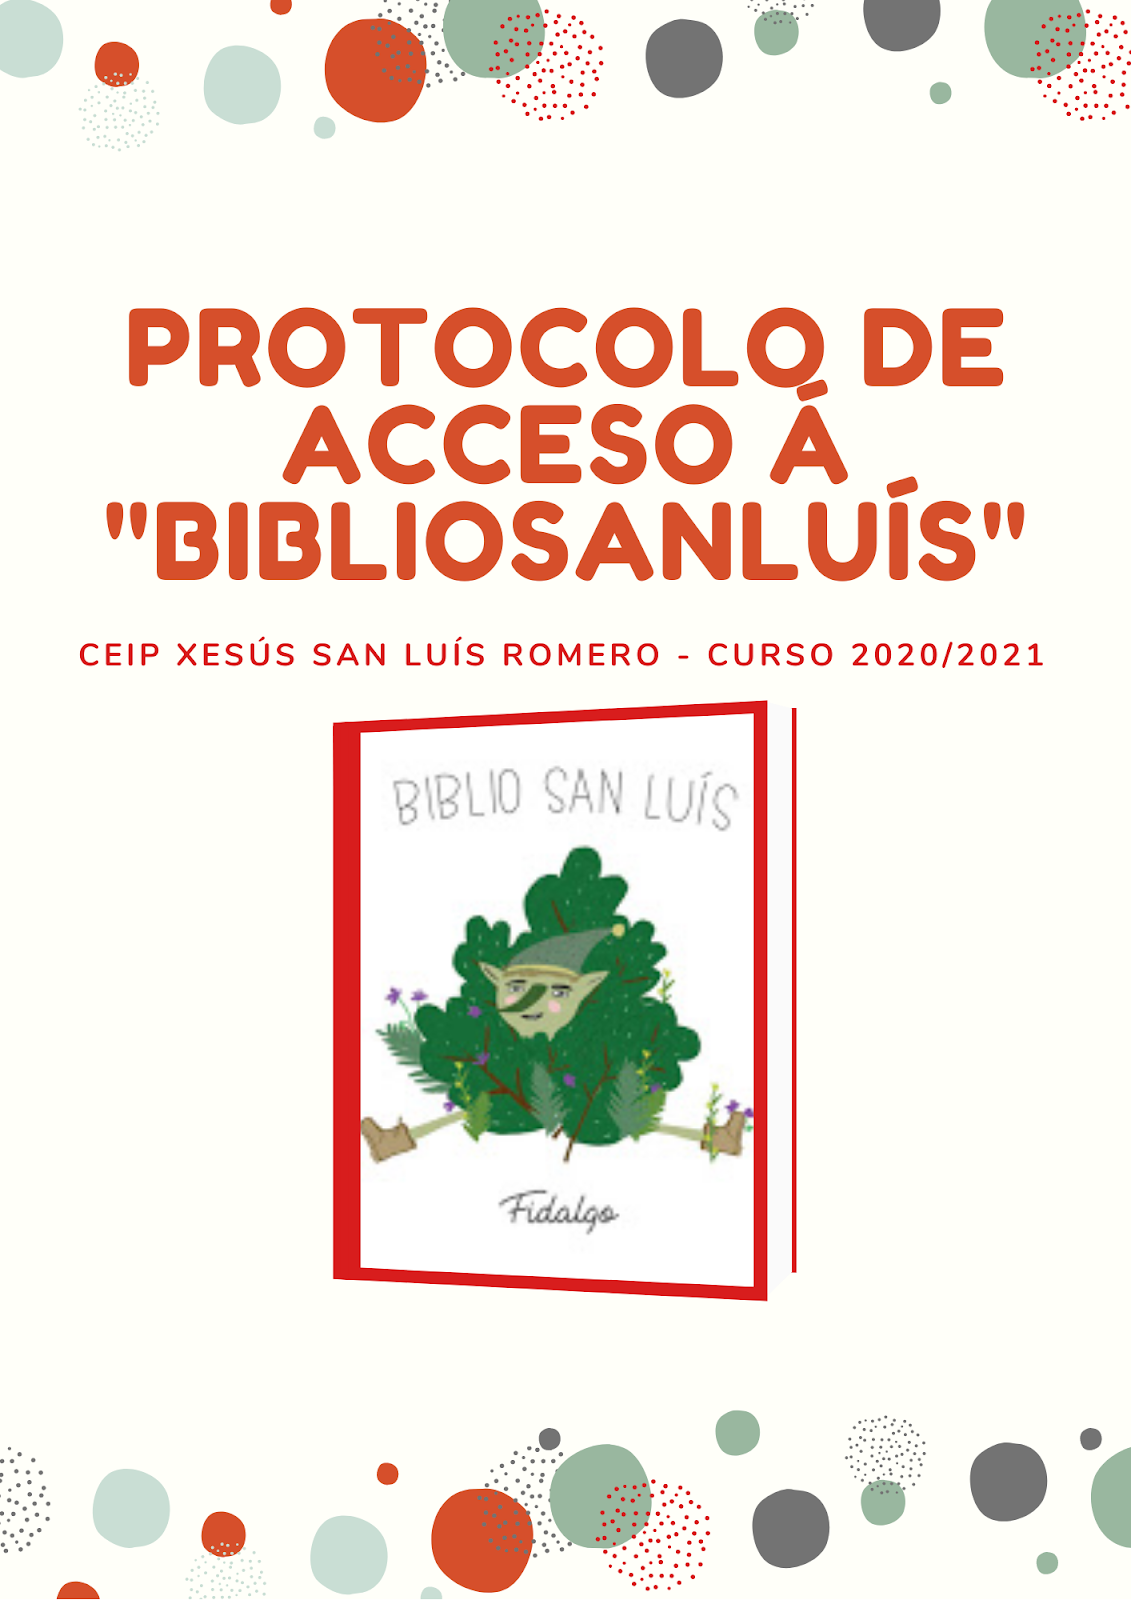 Protocolo de acceso á Bibliosanluís